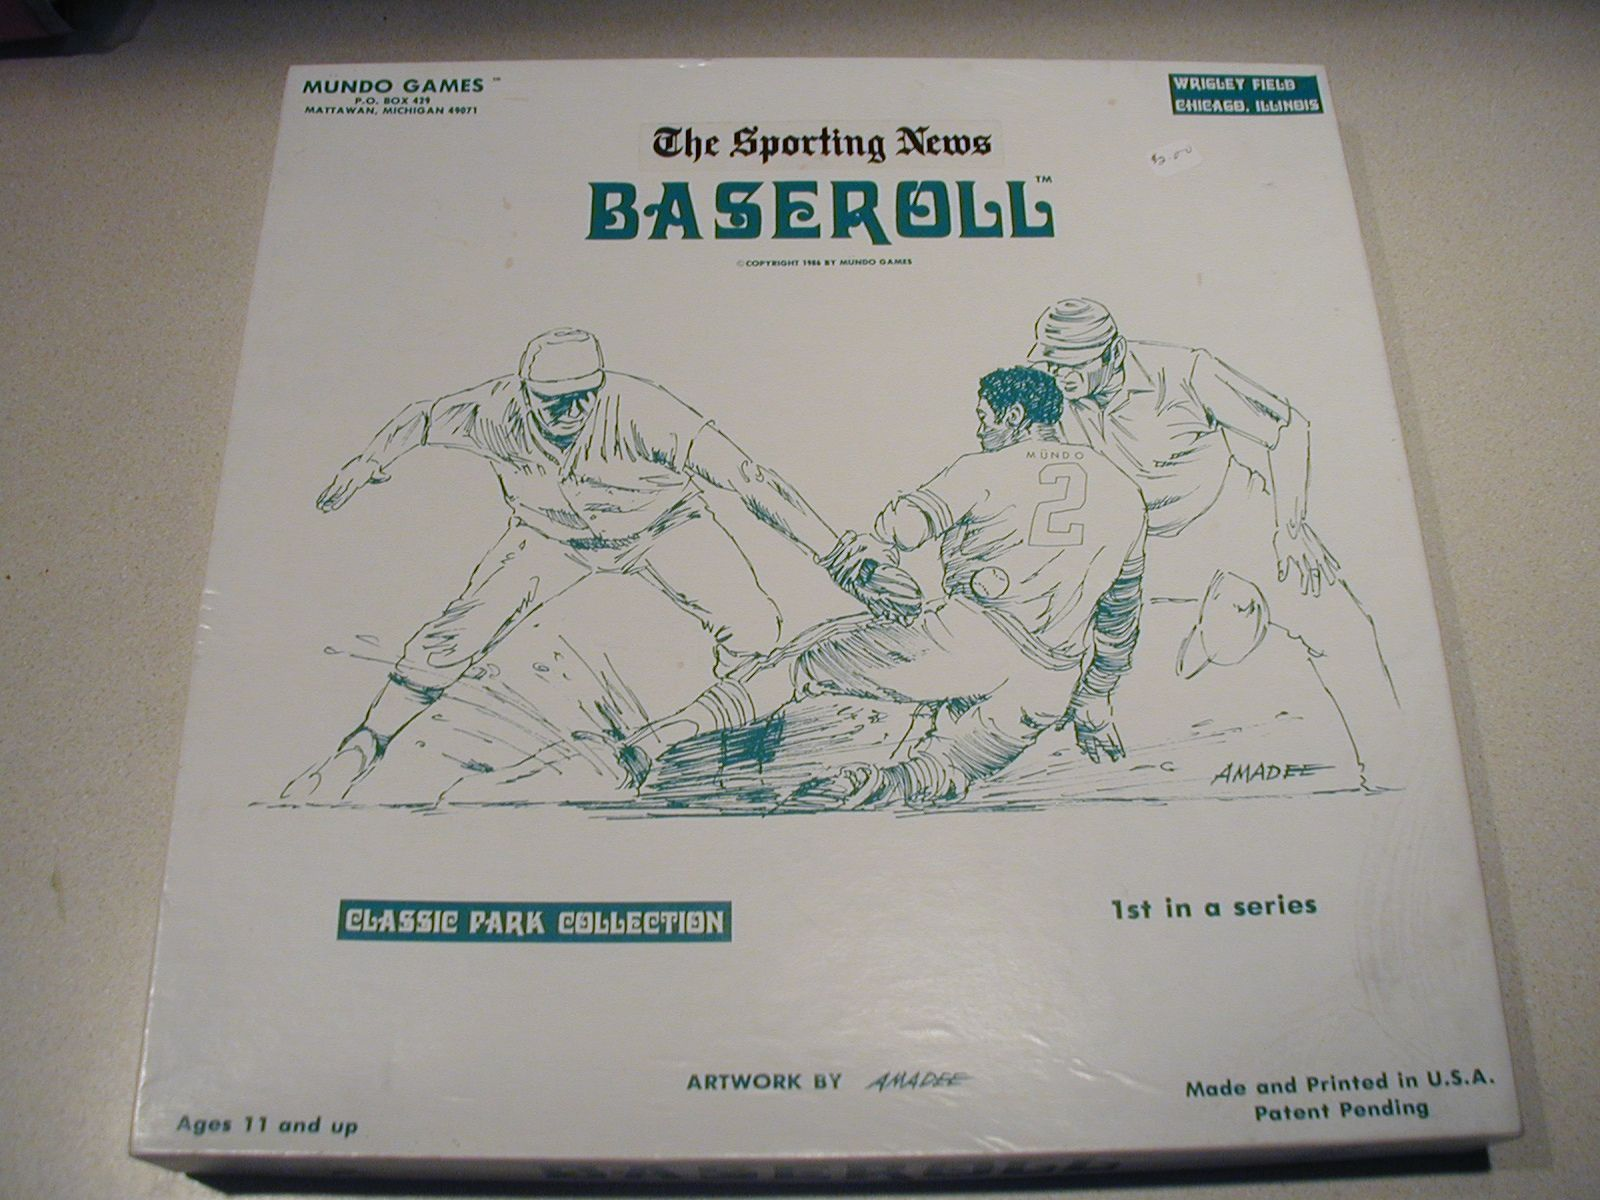 The Sporting News: Baseroll